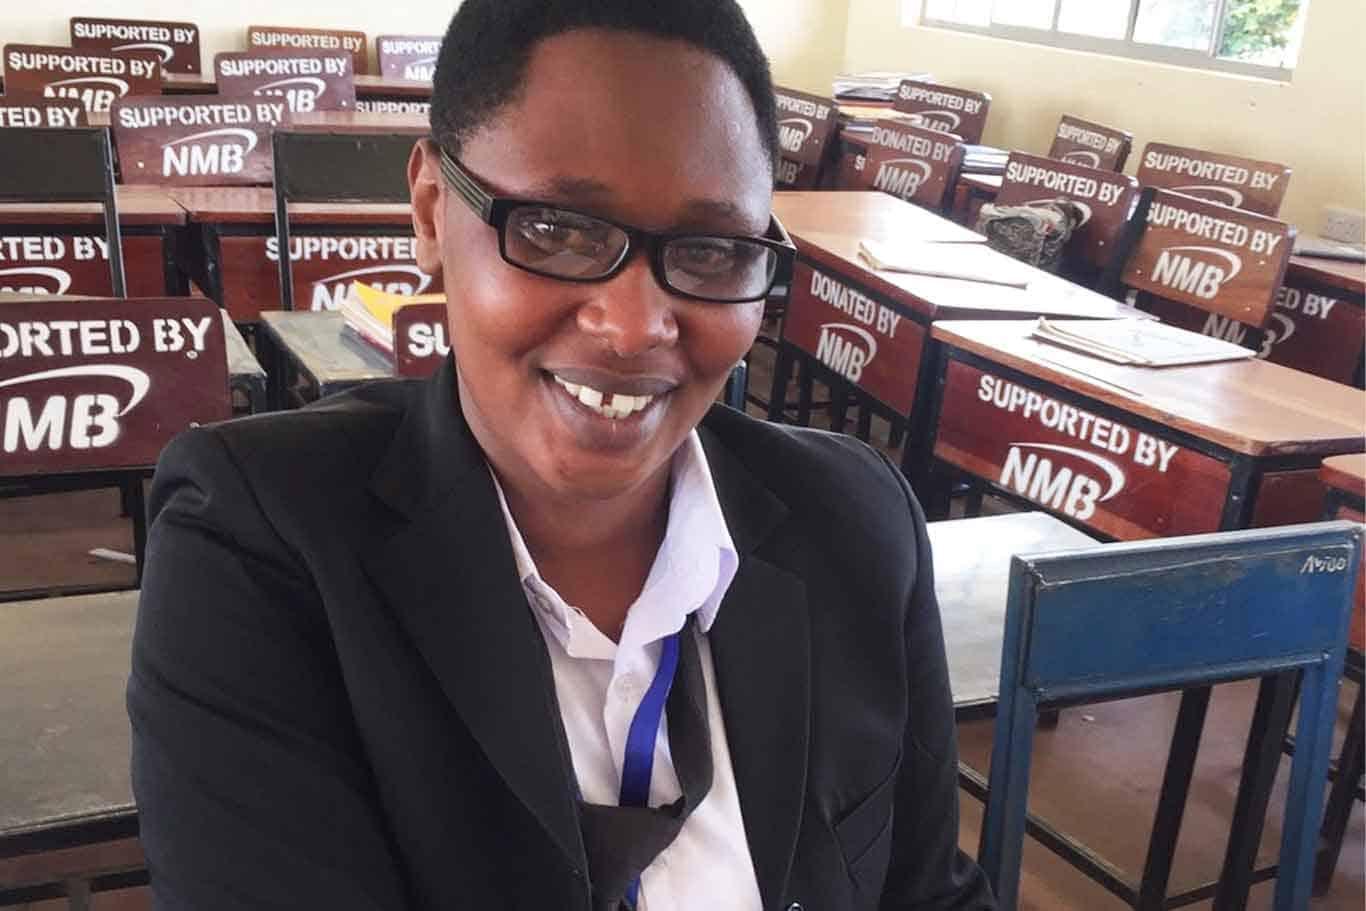 Judith a teacher at the Tanzanian Teachers' Training College